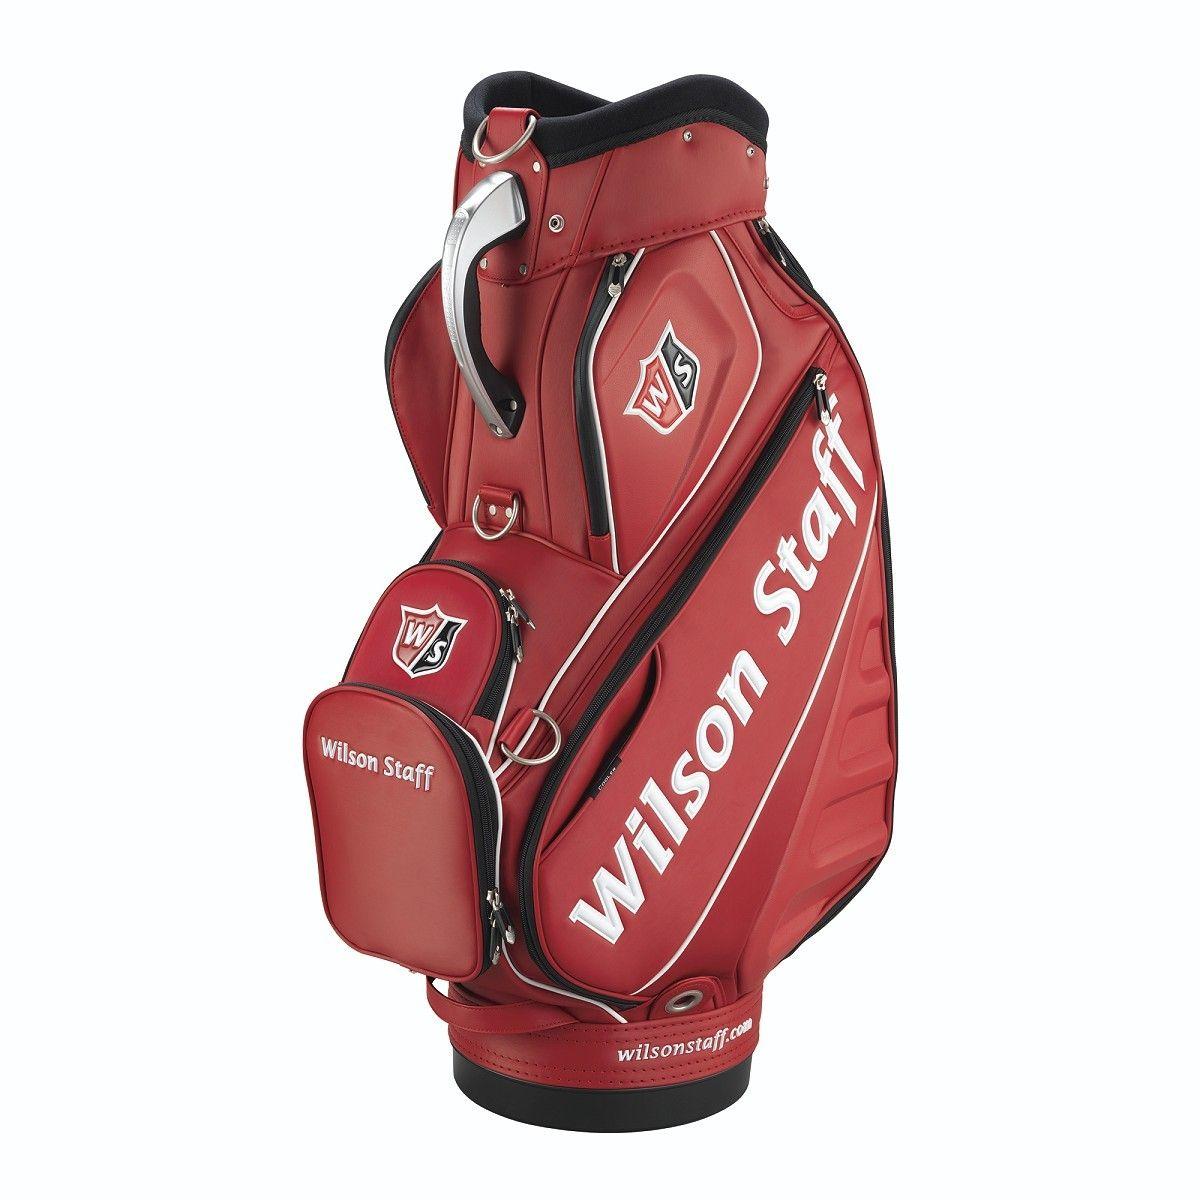 Wilson Staff Pro Tour Bag Red Golf bags, Ladies golf